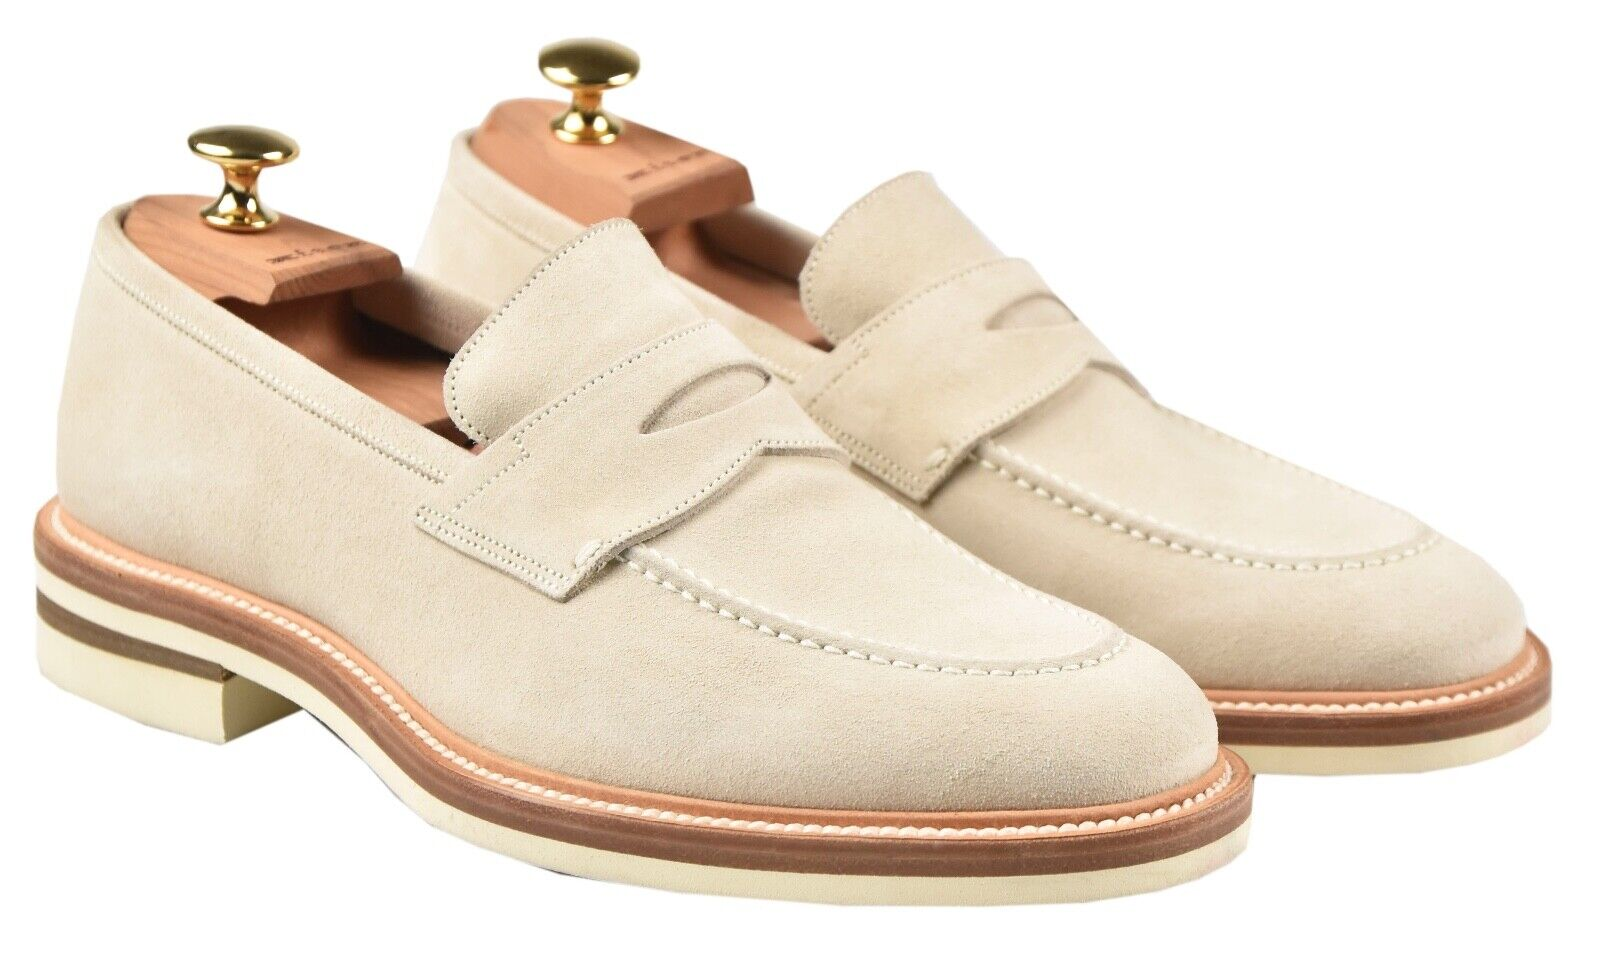 NEW KITON DRESS scarpe 100% LEATHER SZ 6 US 39 EU 19O119